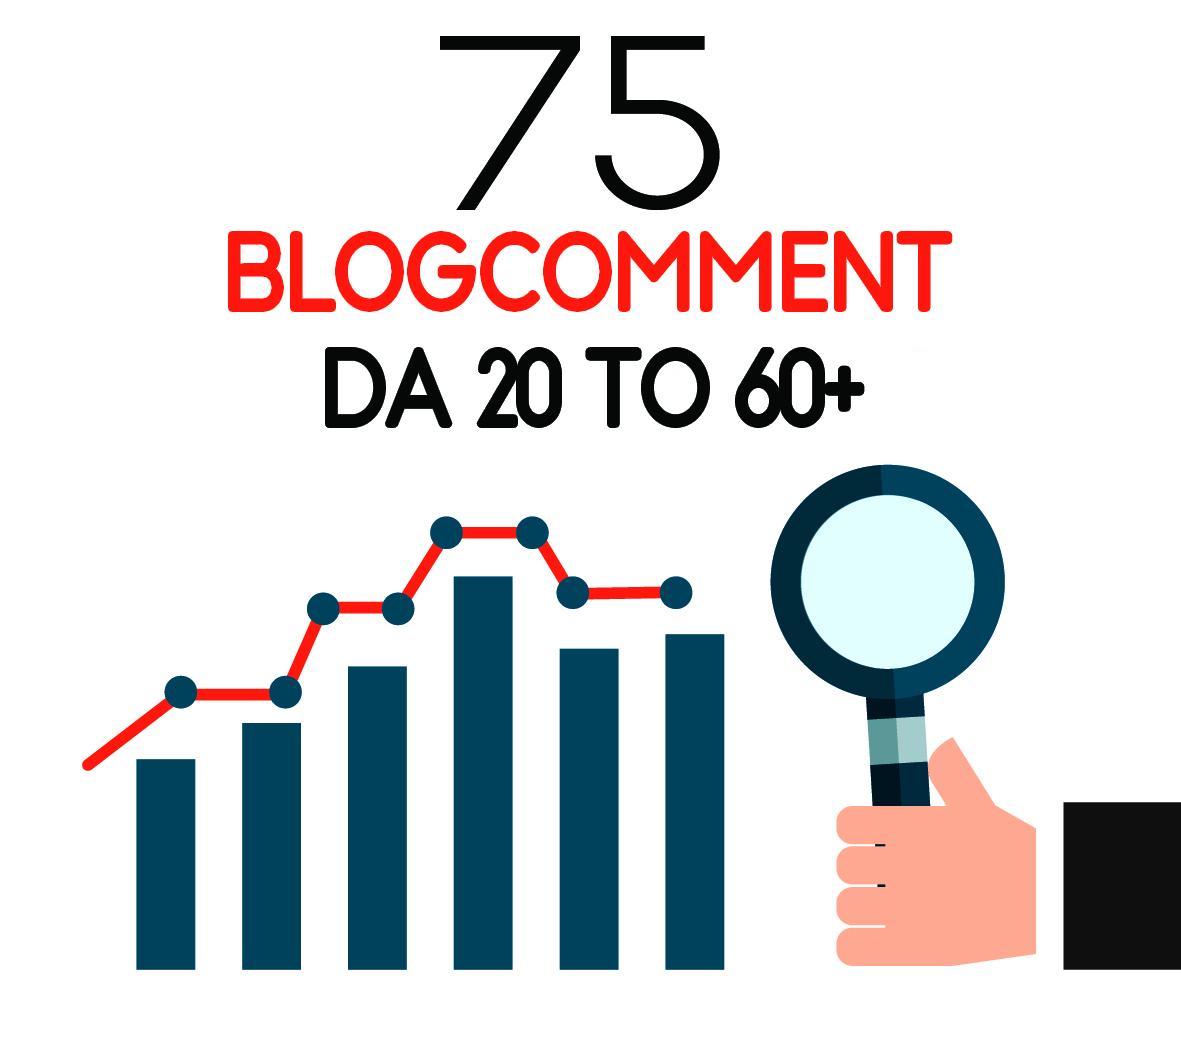 I will do manually 75 blog comment DA 20 to 60+